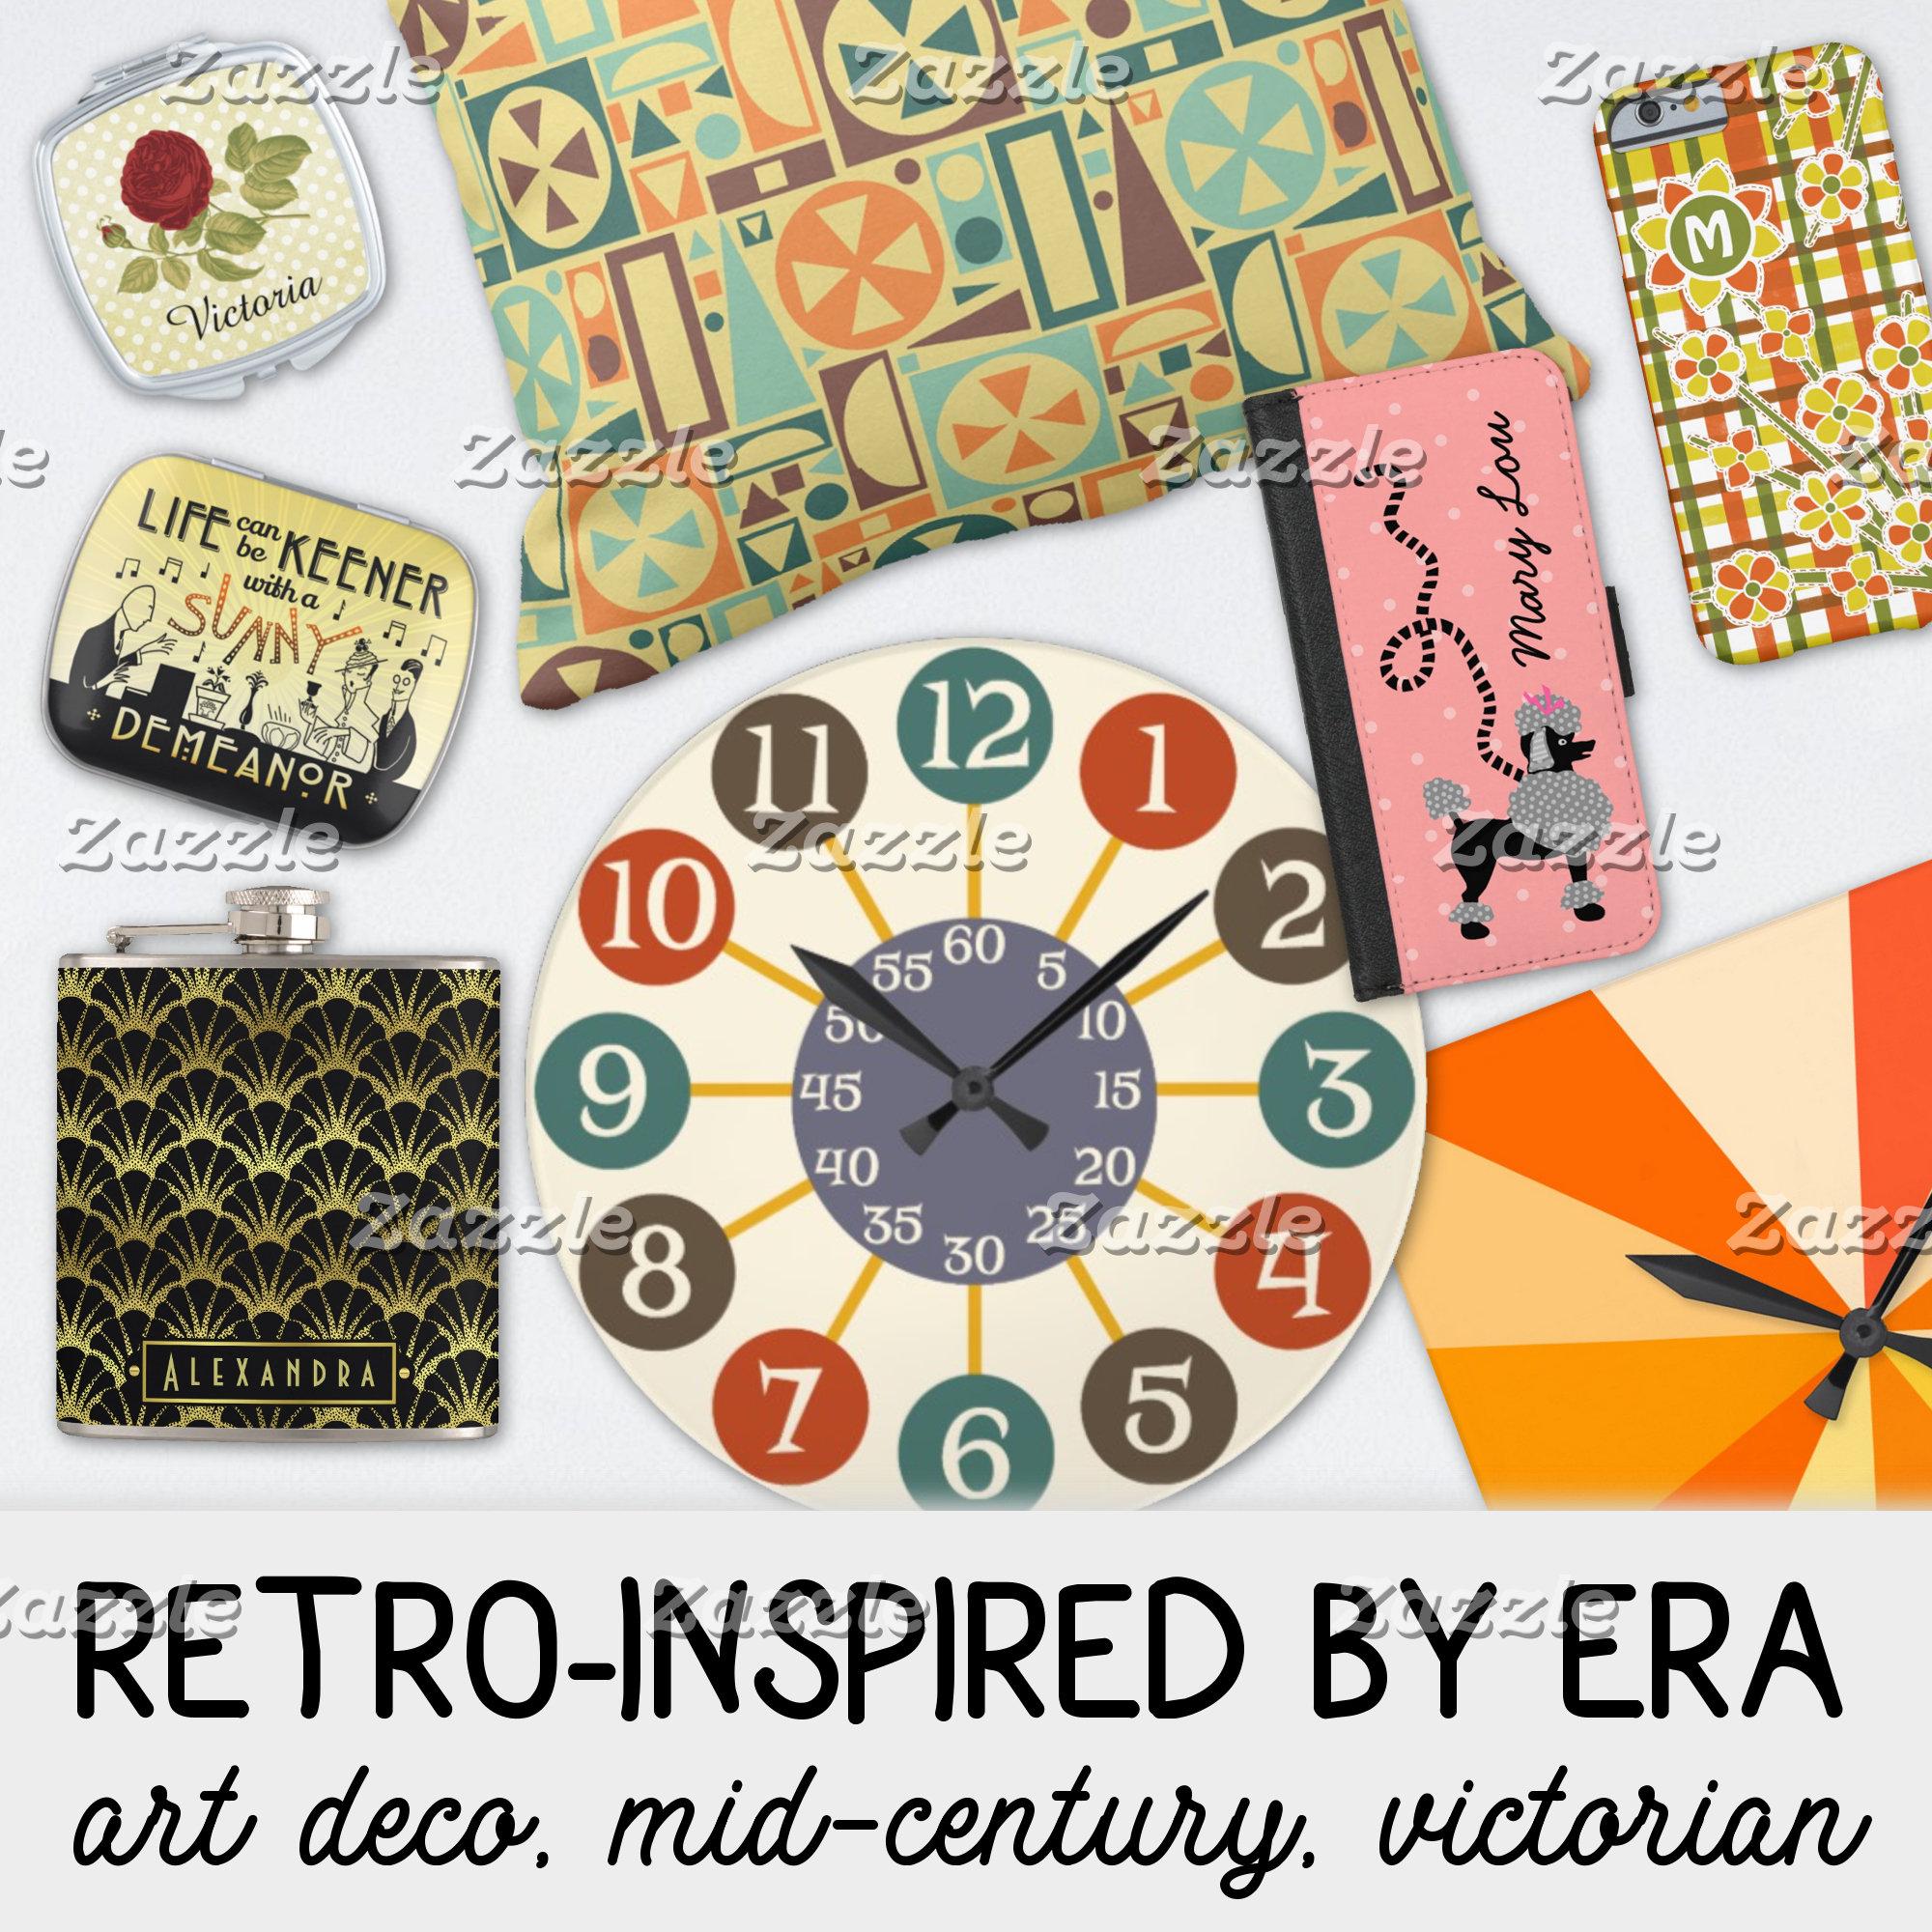 RETRO-INSPIRED BY ERA